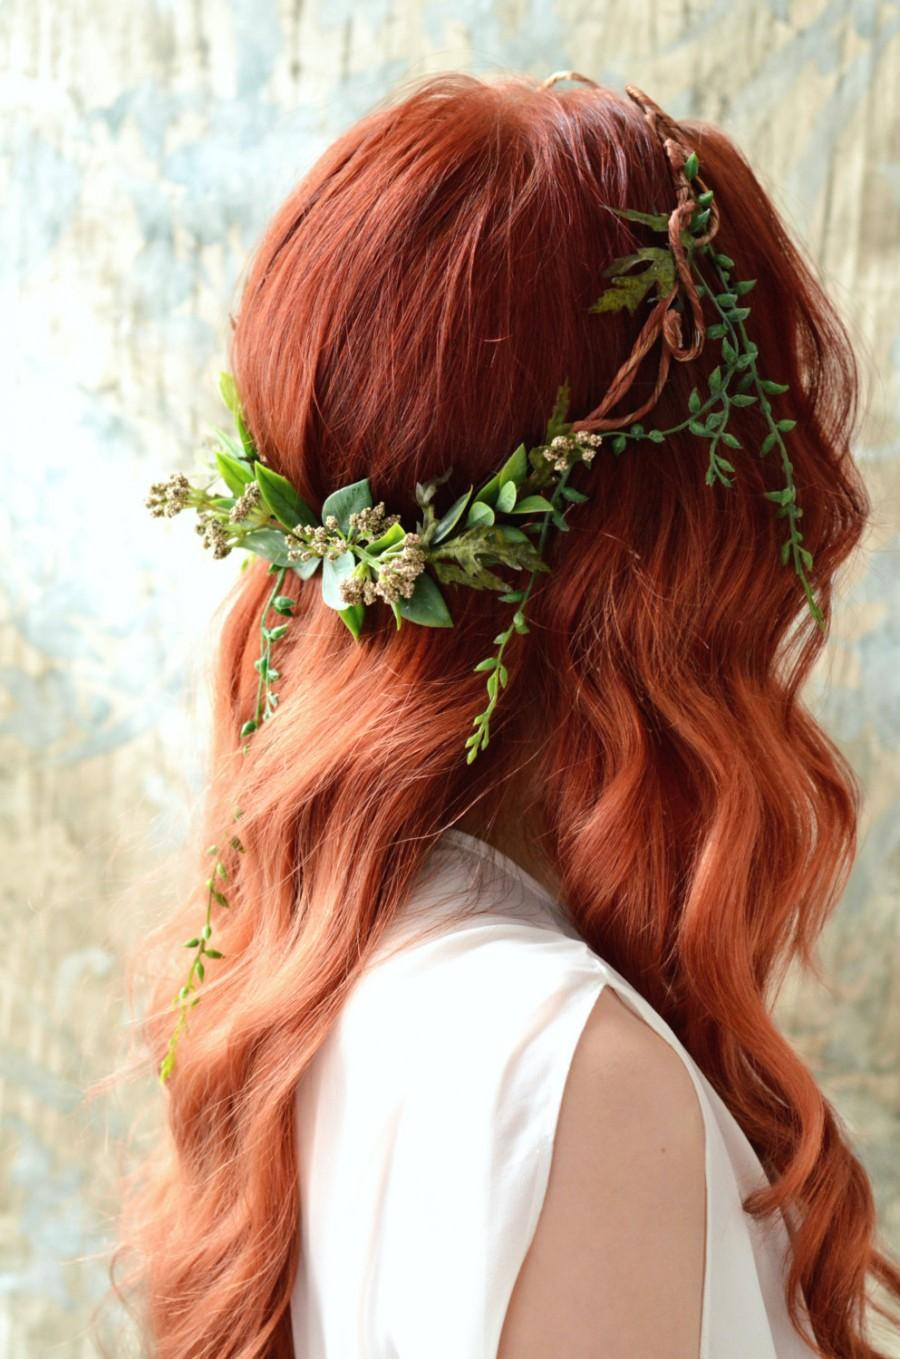 Dess Leaf Crown Woodland Headpiece Forest Circlet Rustic Wedding Hair Accessories